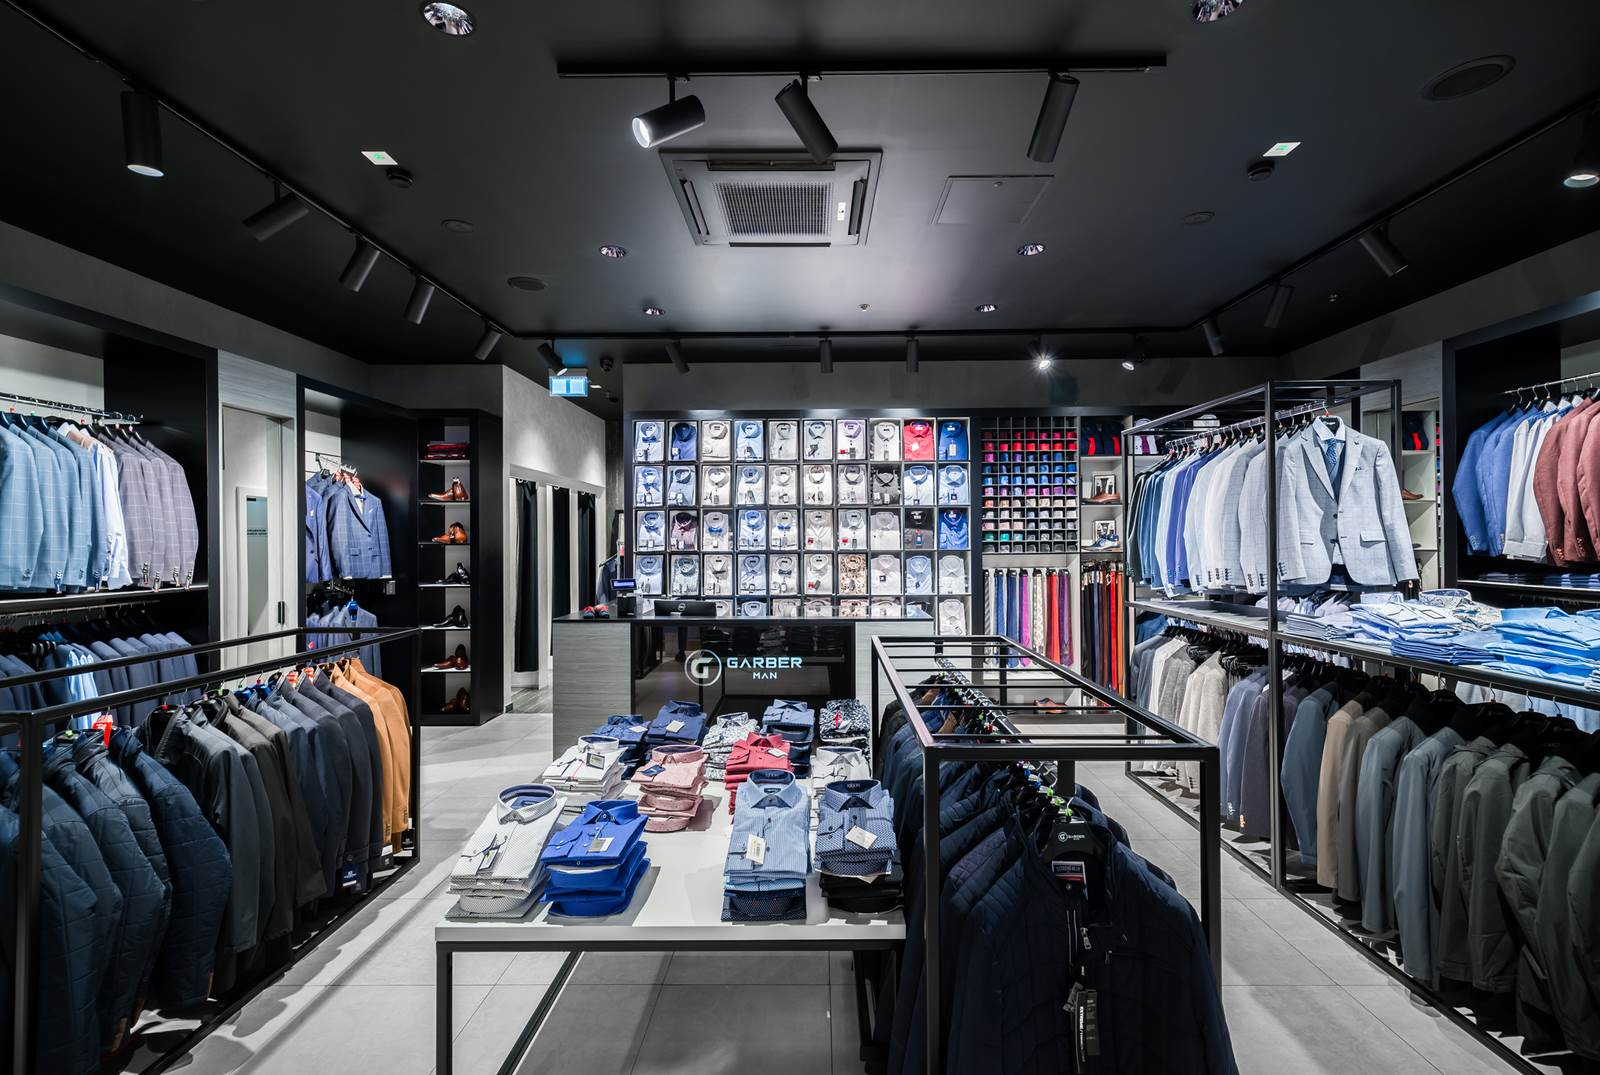 Garber - sklep z modą męską w Gdańsku